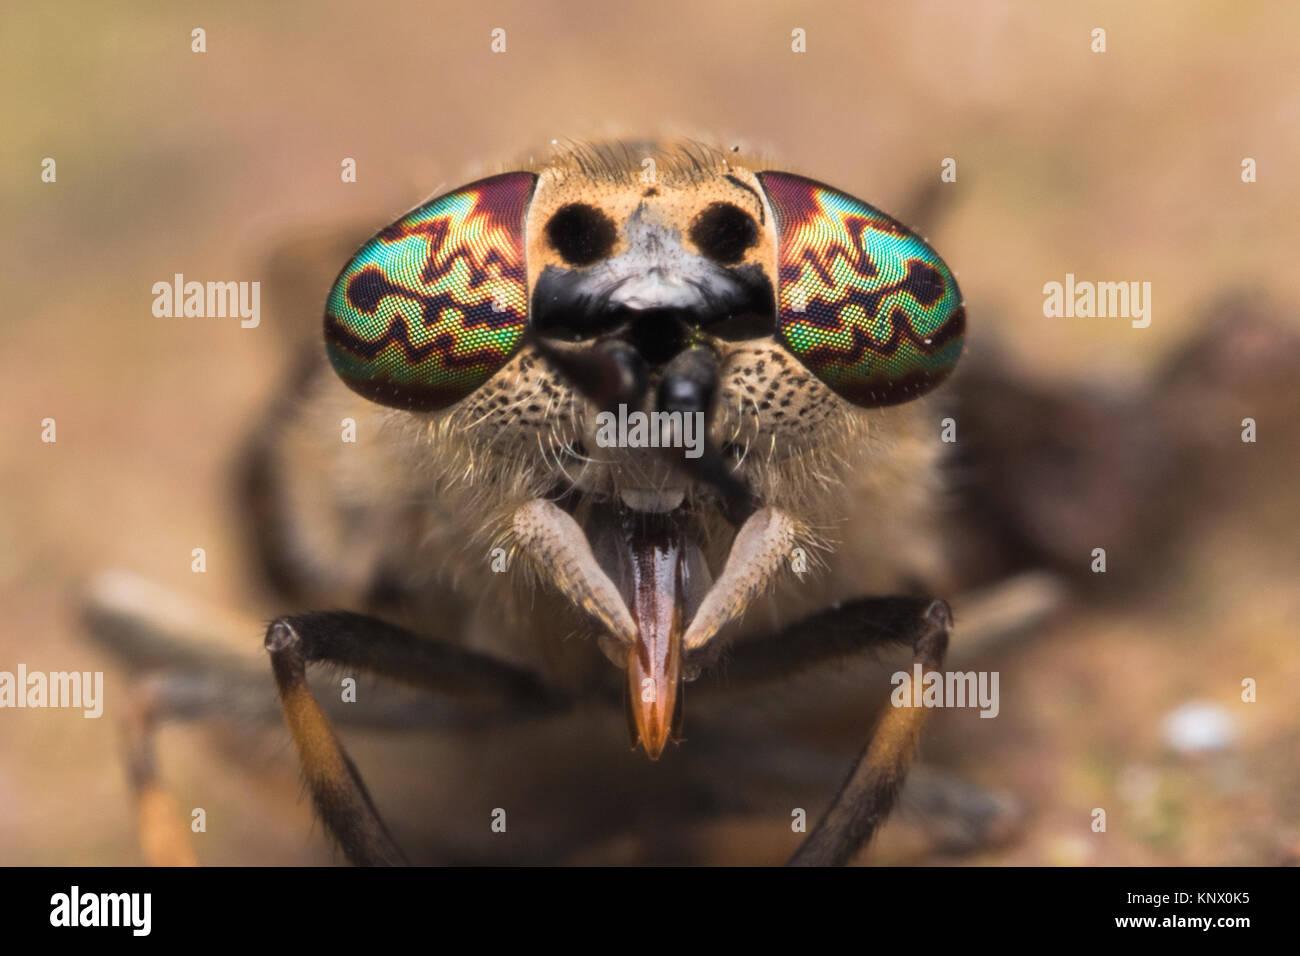 Notch-horned Cleg horsefly female (Haematopota pluvialis) frontal photo showing the very colourful compound eyes. - Stock Image